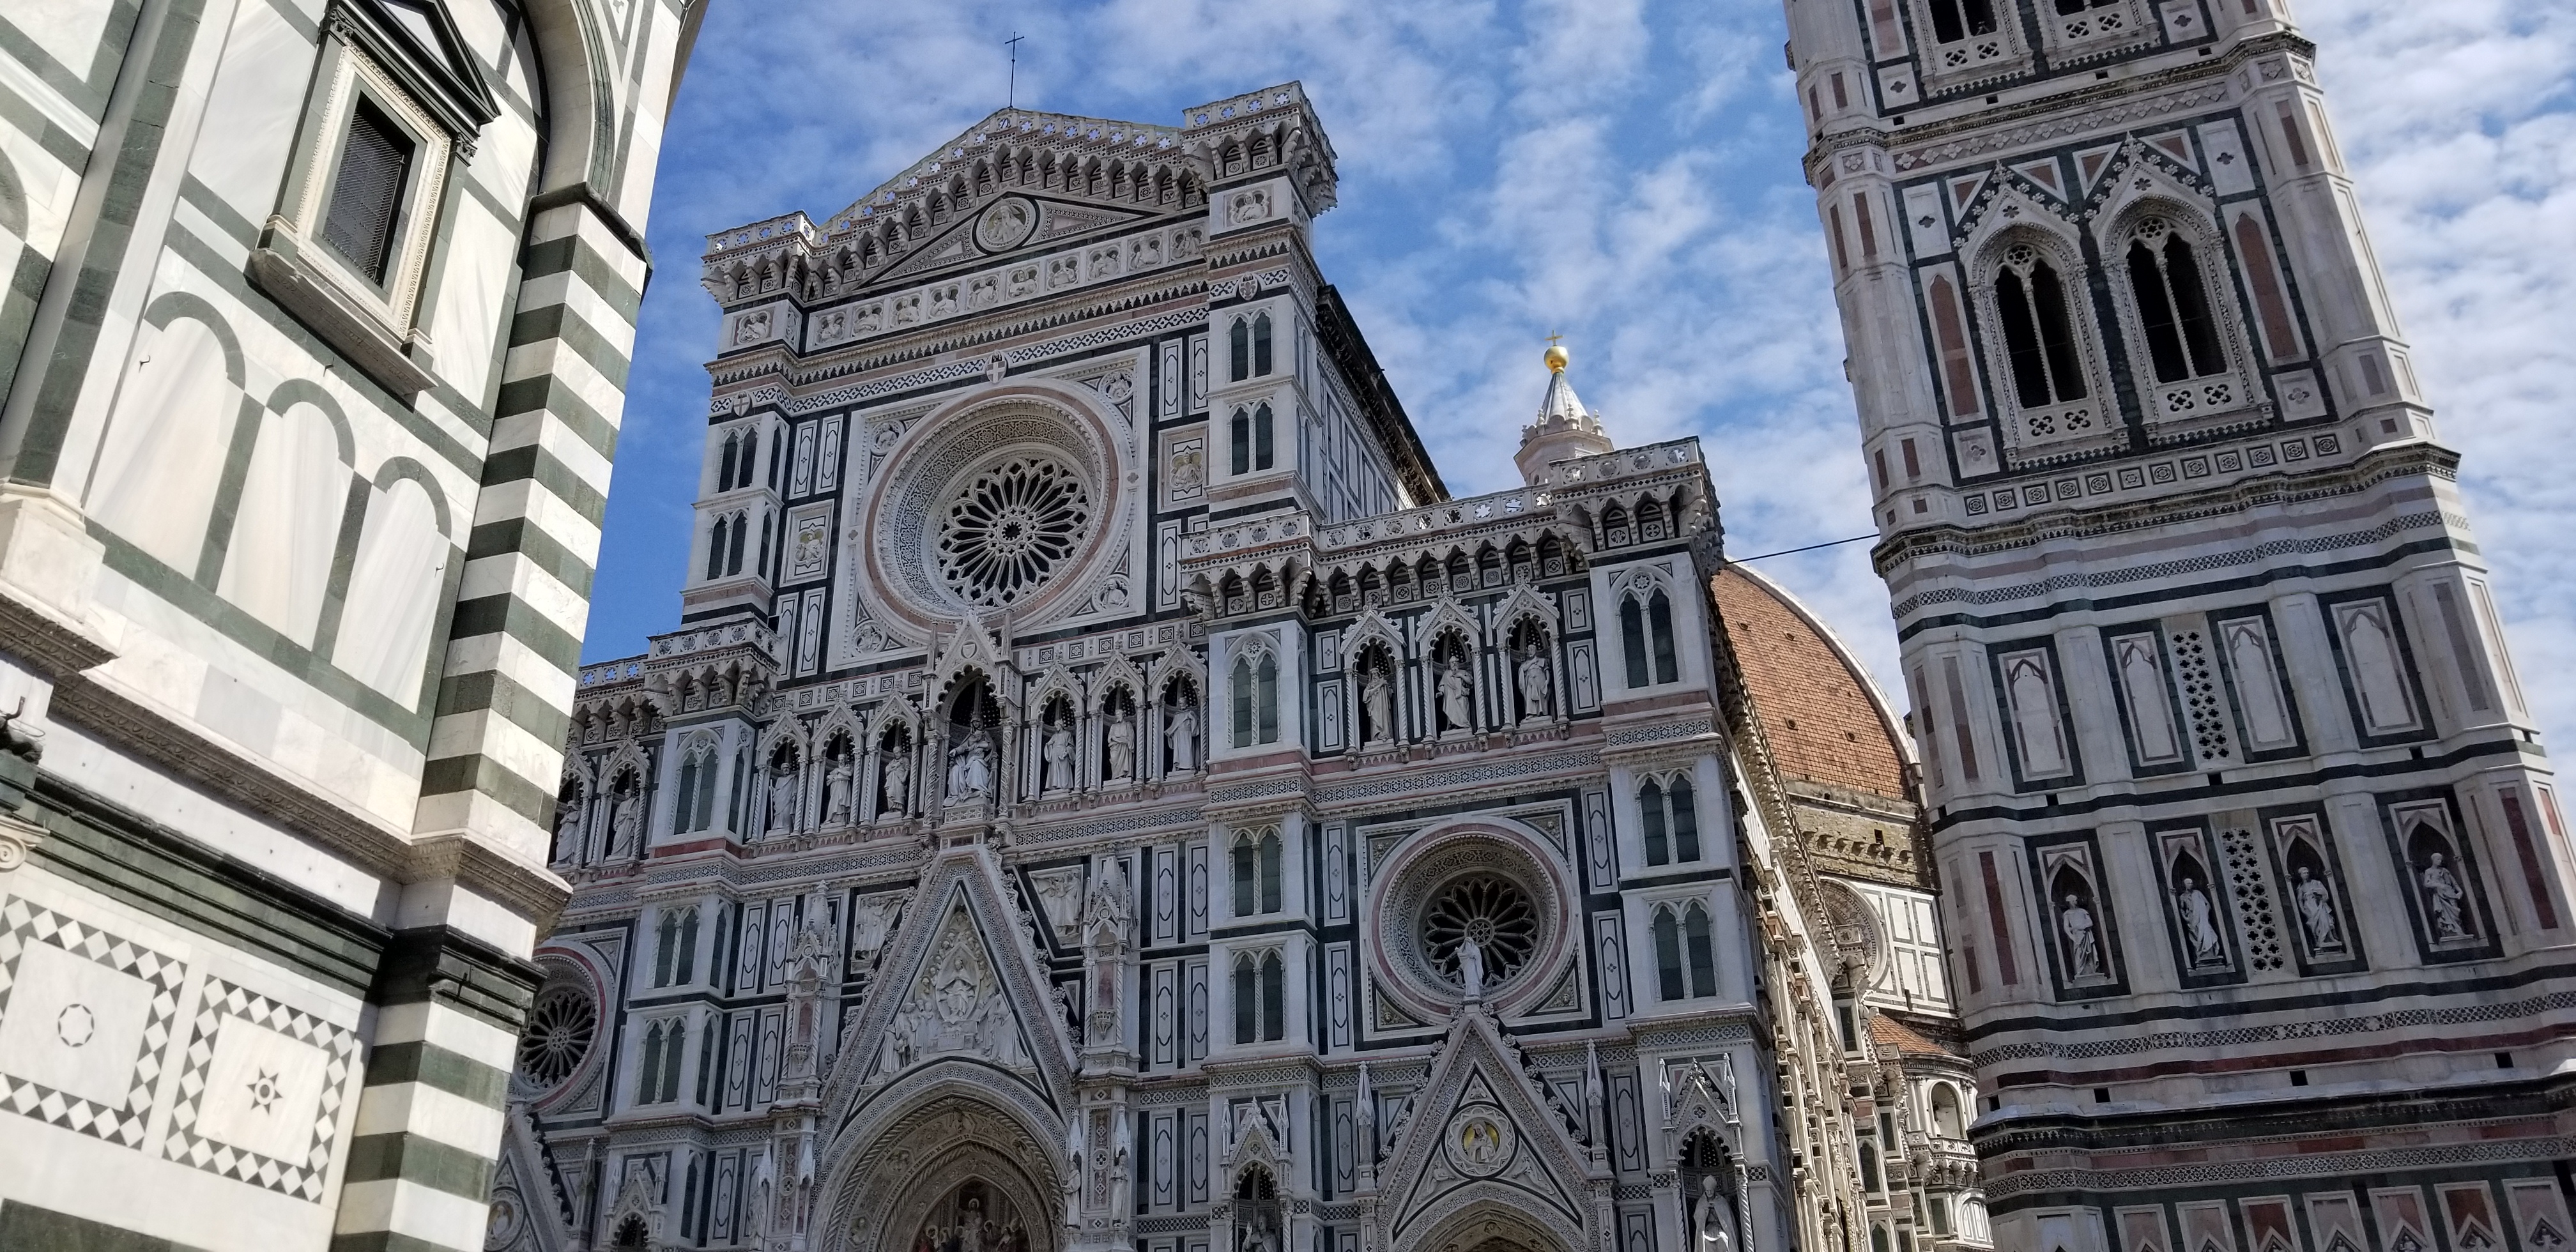 Florence Duomo - Senior Trip to Rome